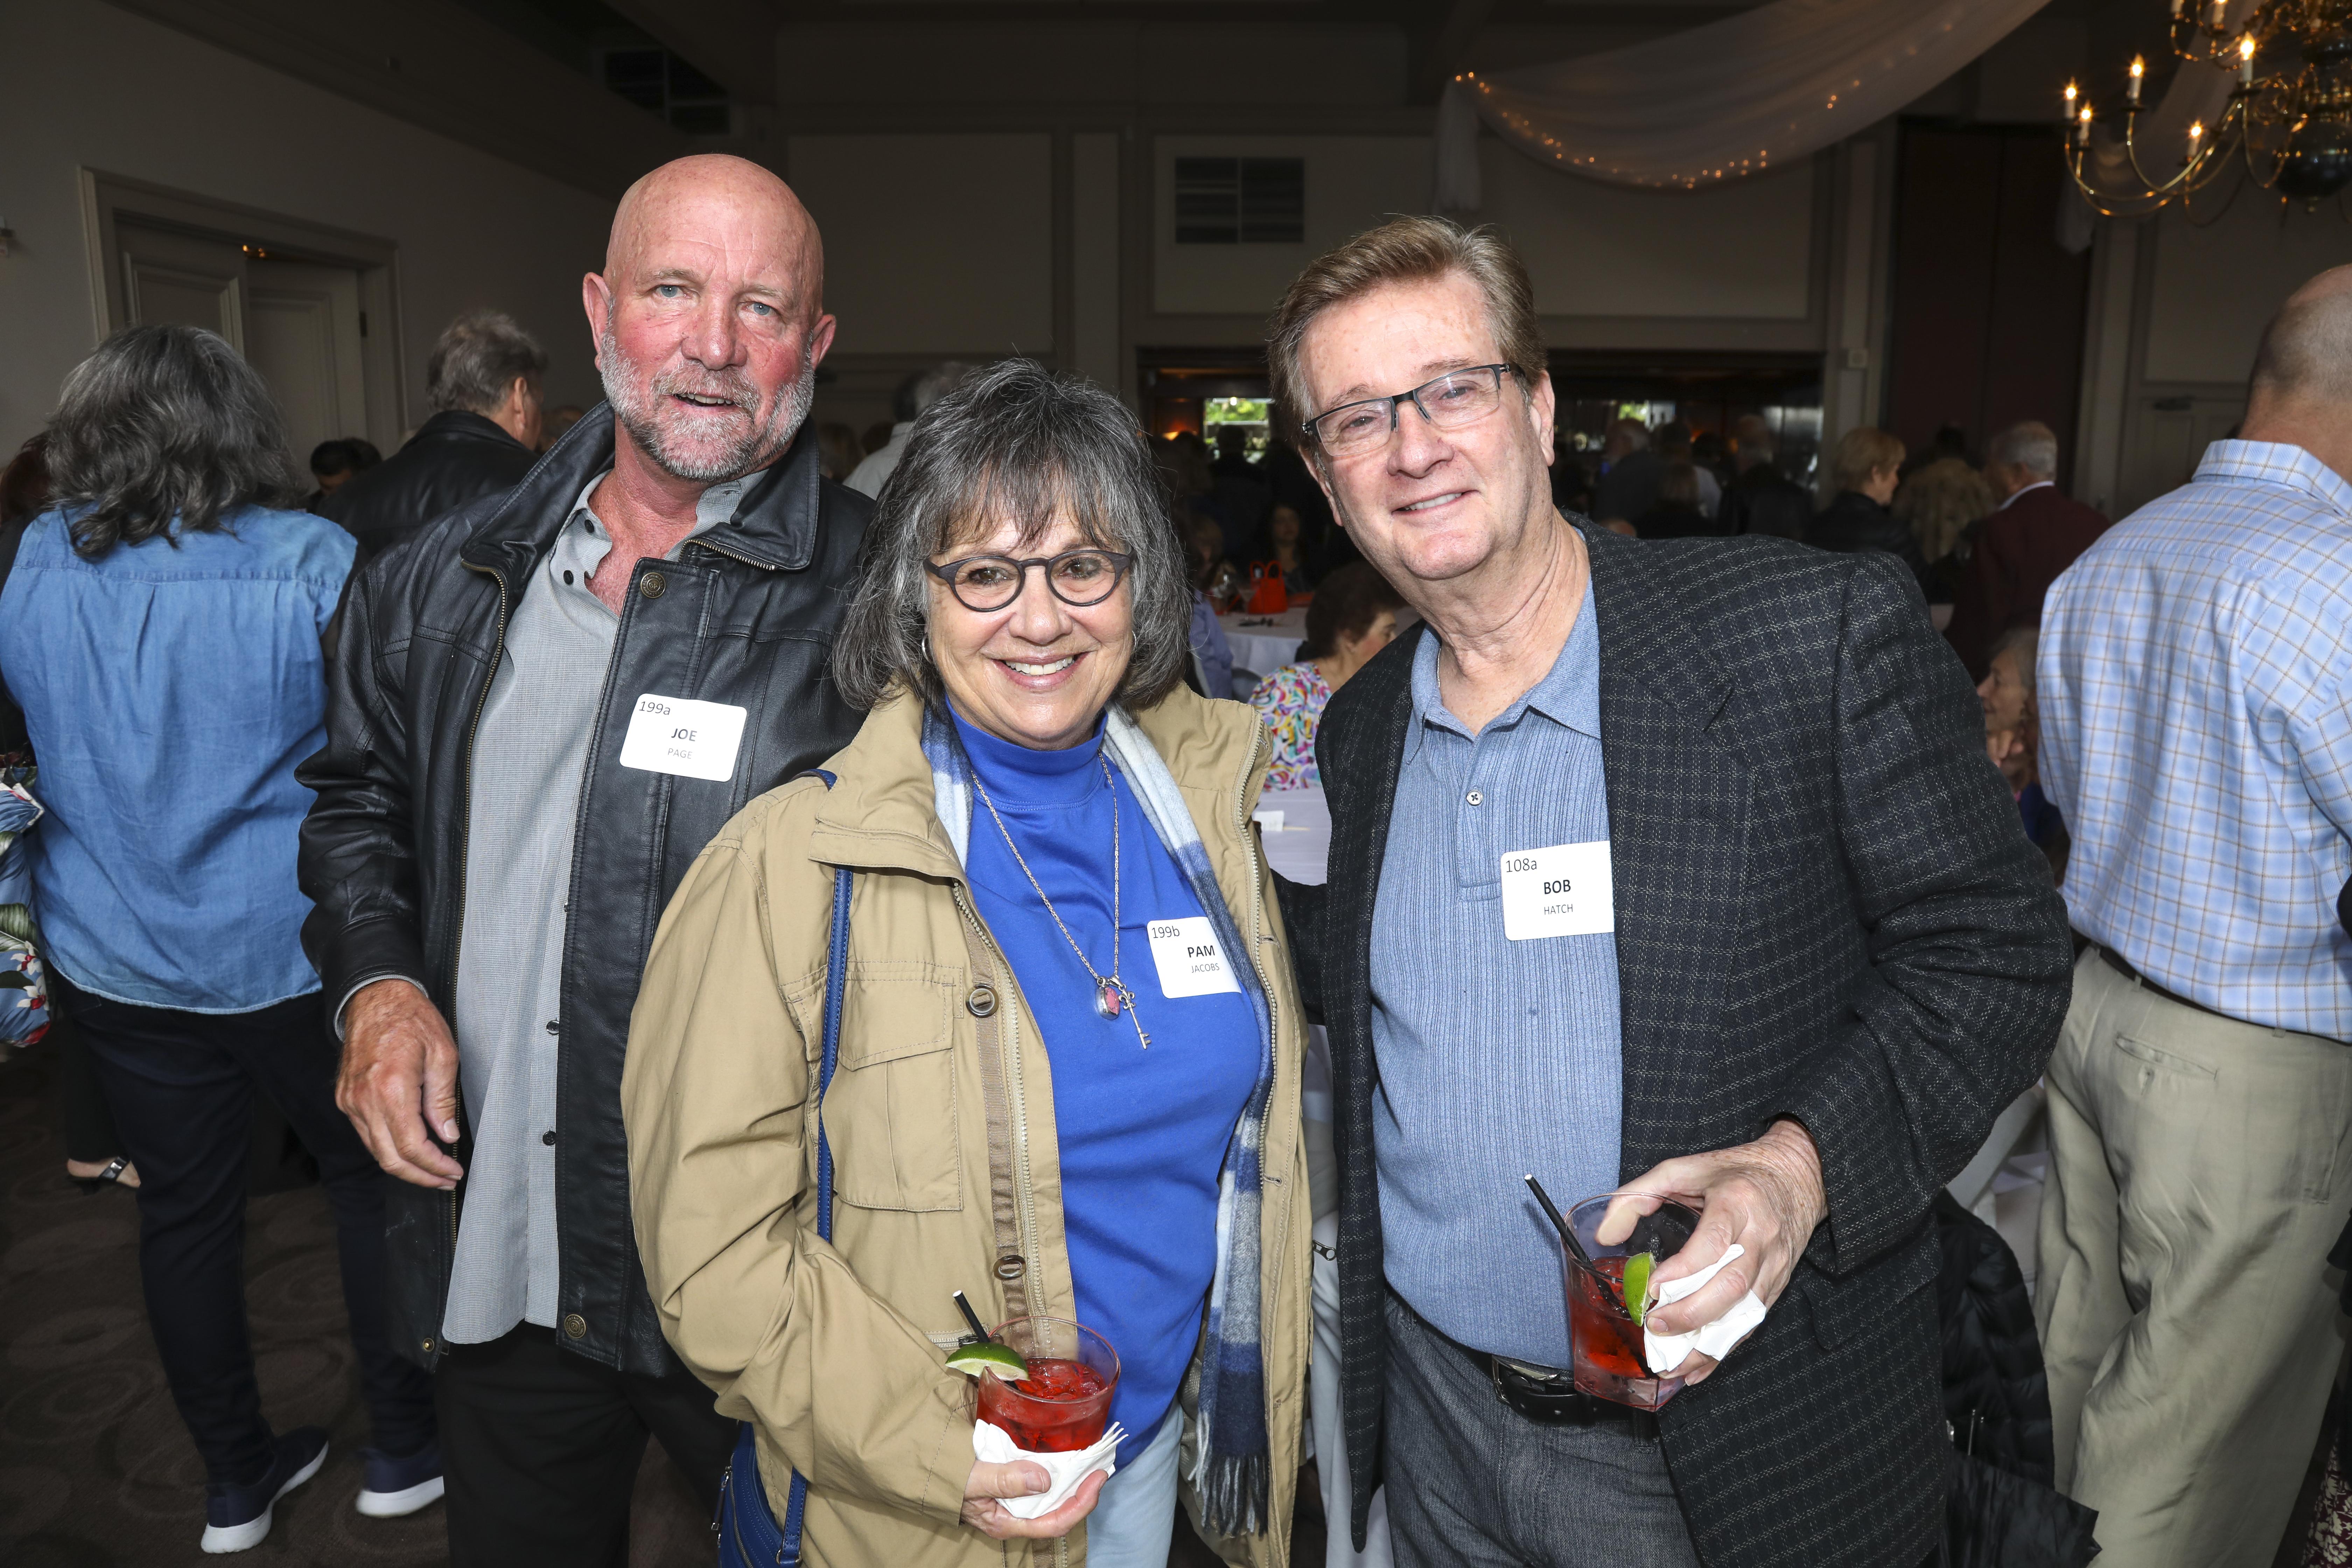 Joe Page, Pam Jacobs, Bob Hatch